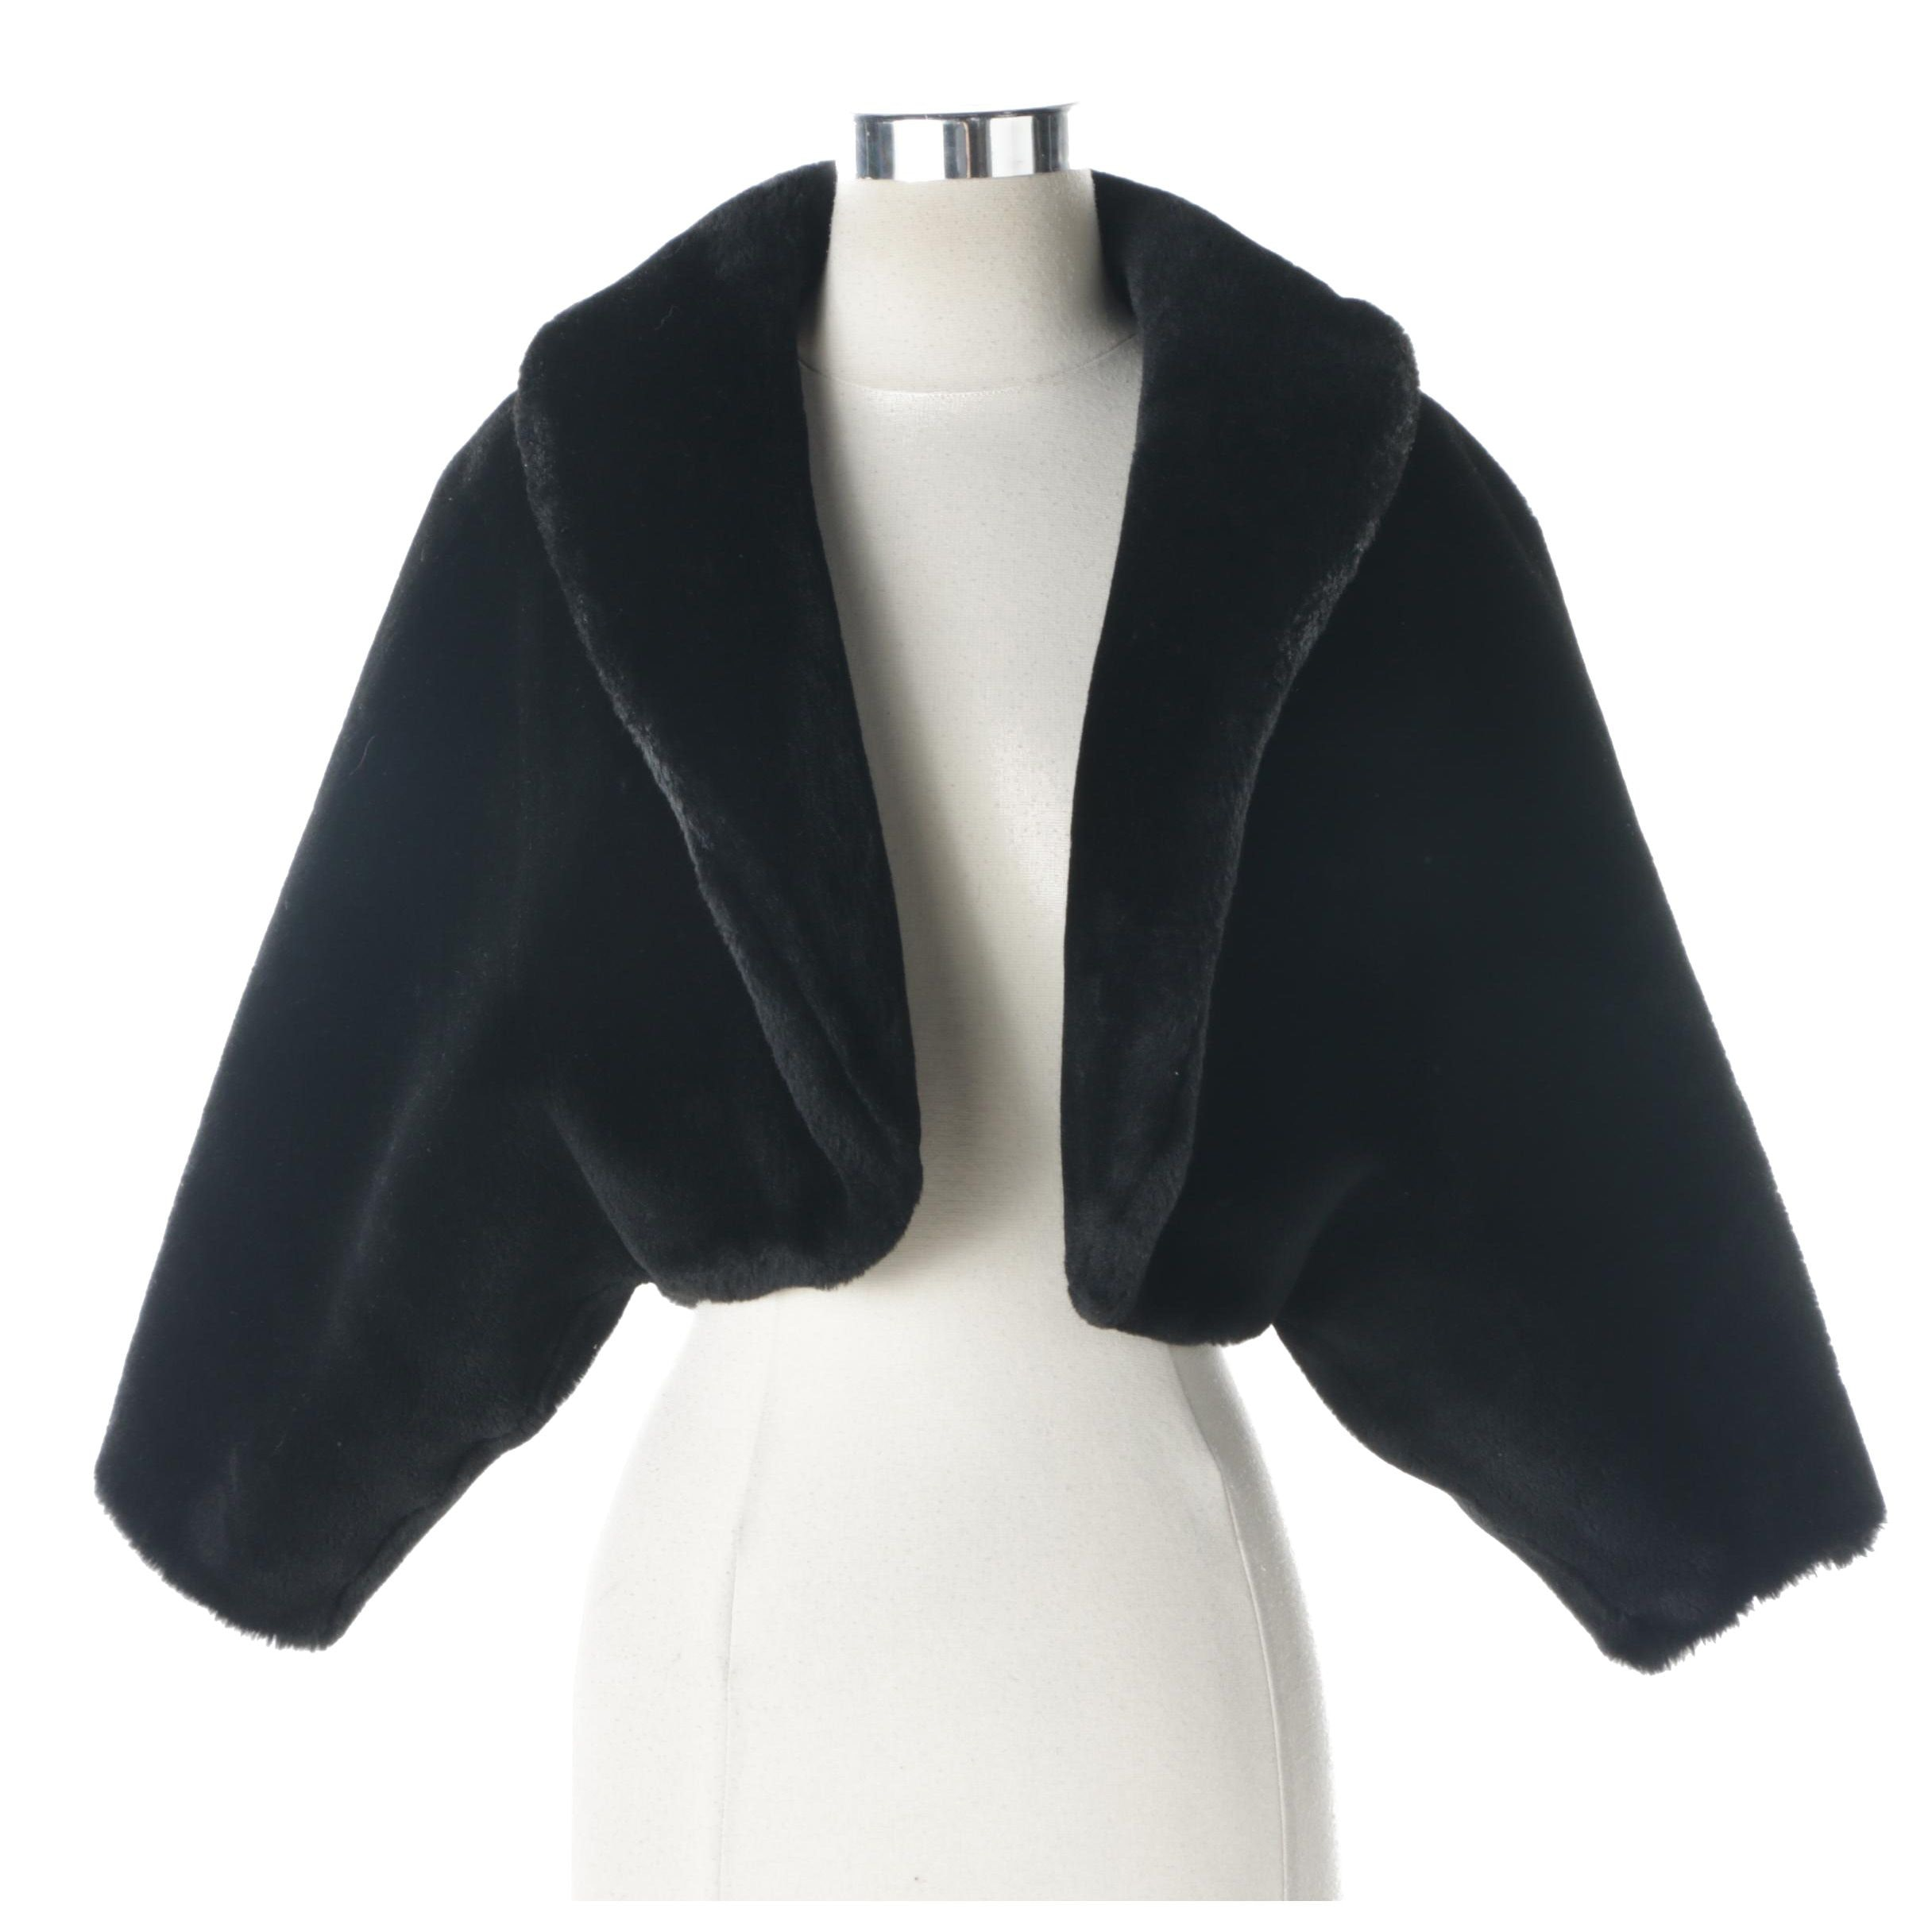 Vintage Princeton's Ollegro Black Faux Fur Cropped Jacket